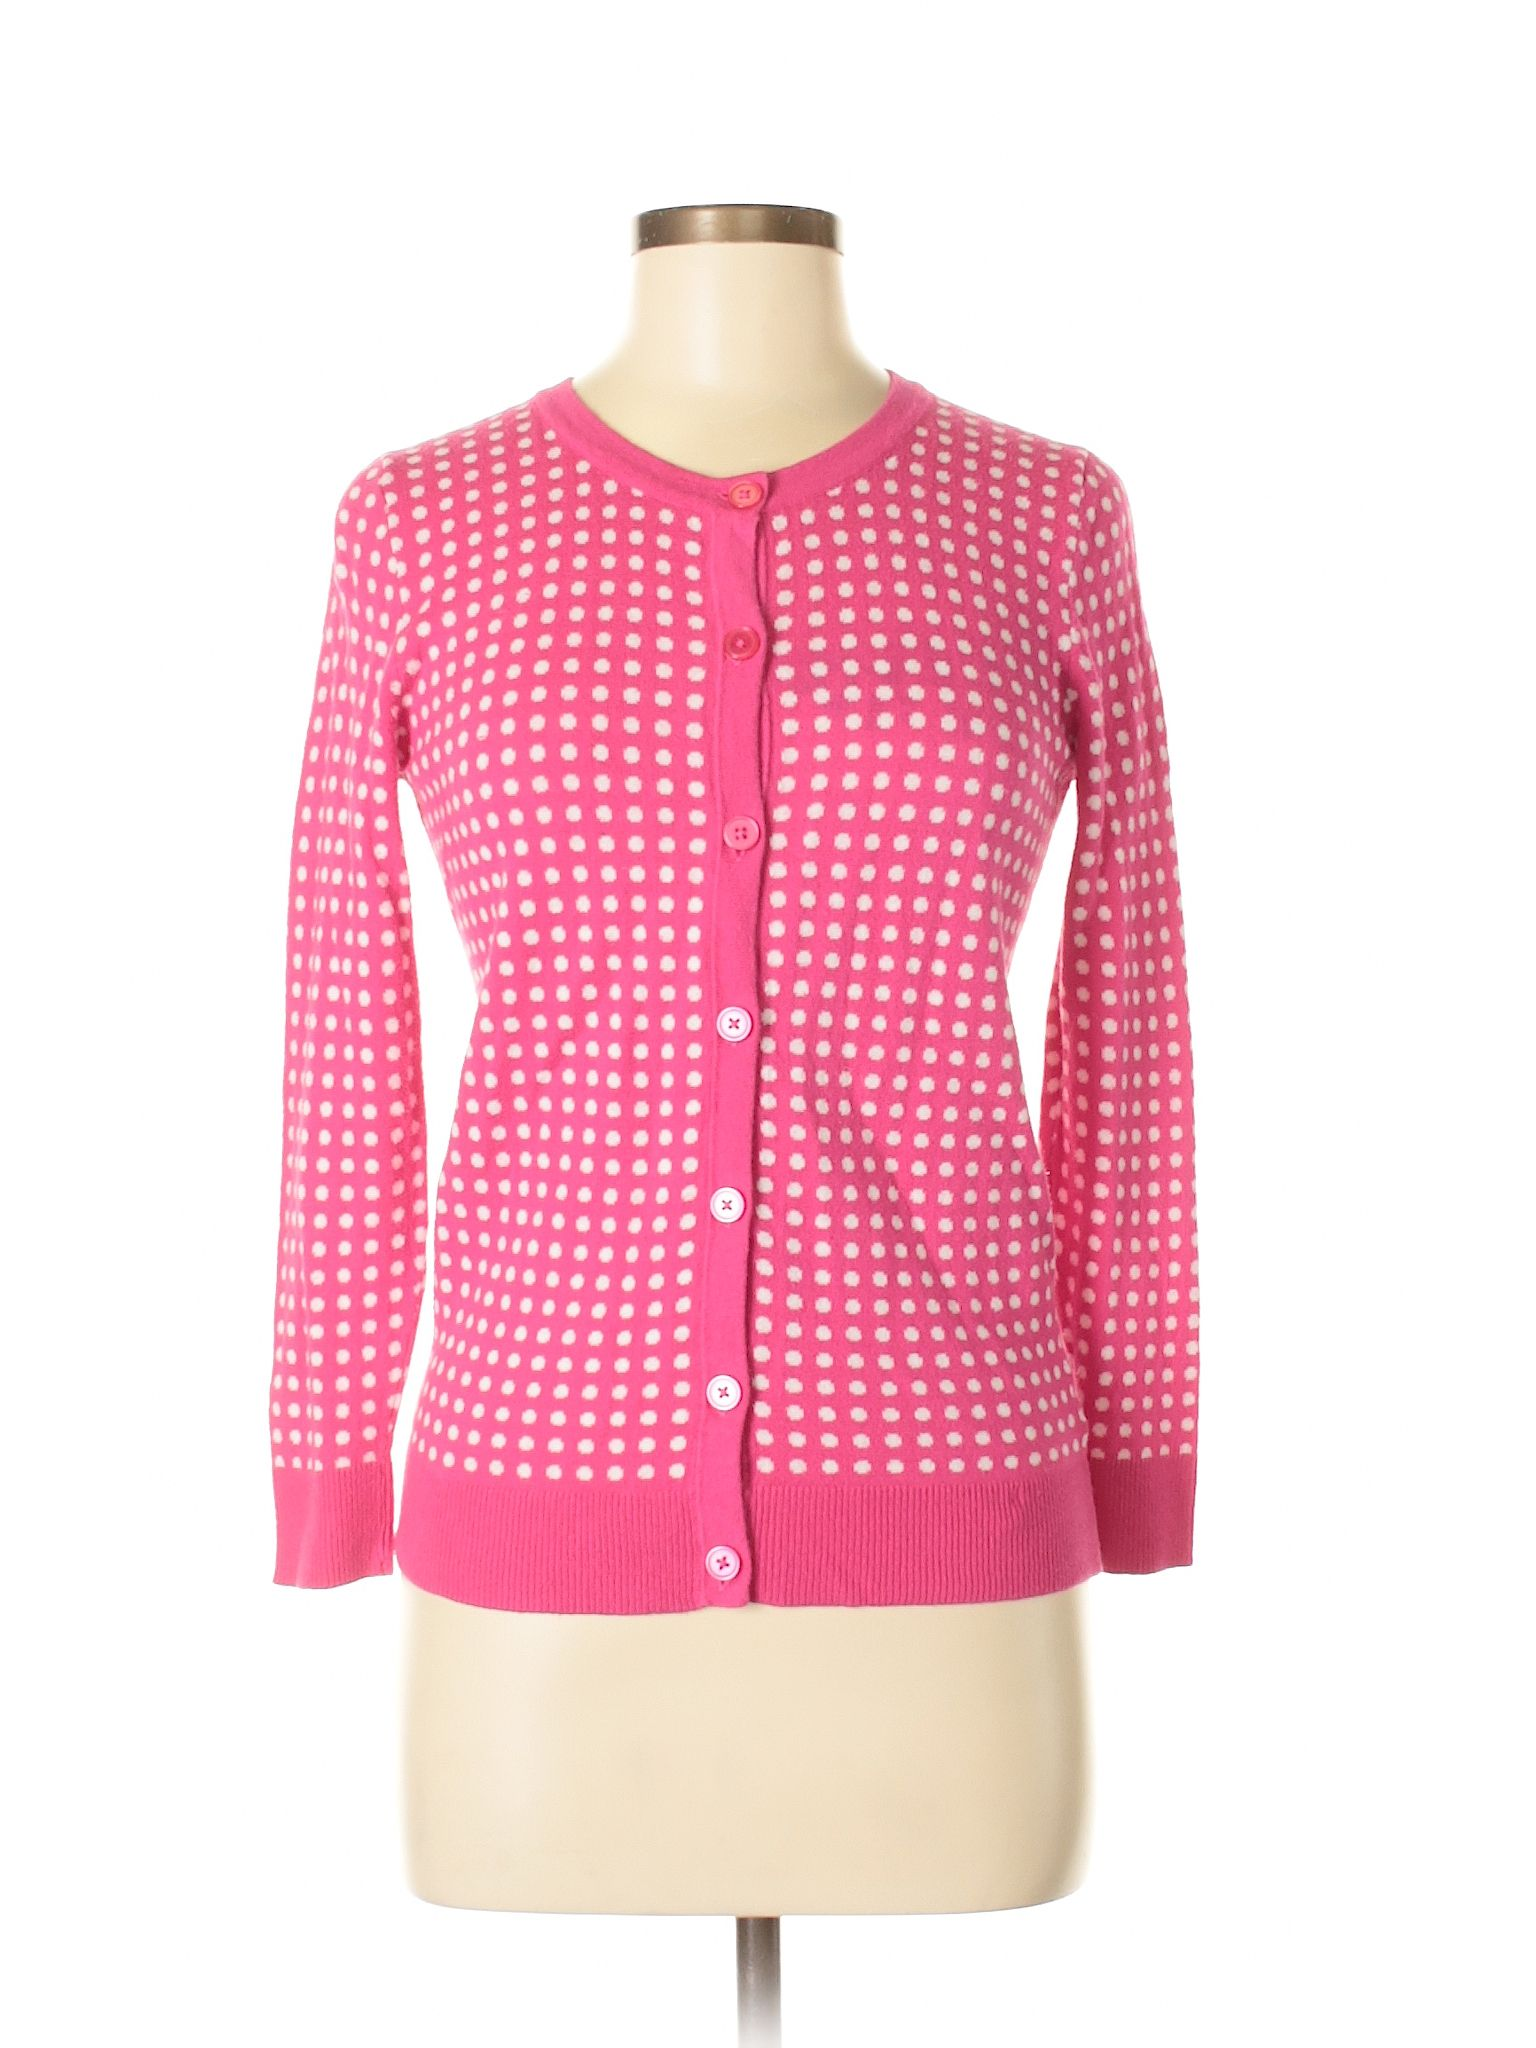 Merona Cardigan Size 400 Pink Womens Sweaters & Sweatshirts